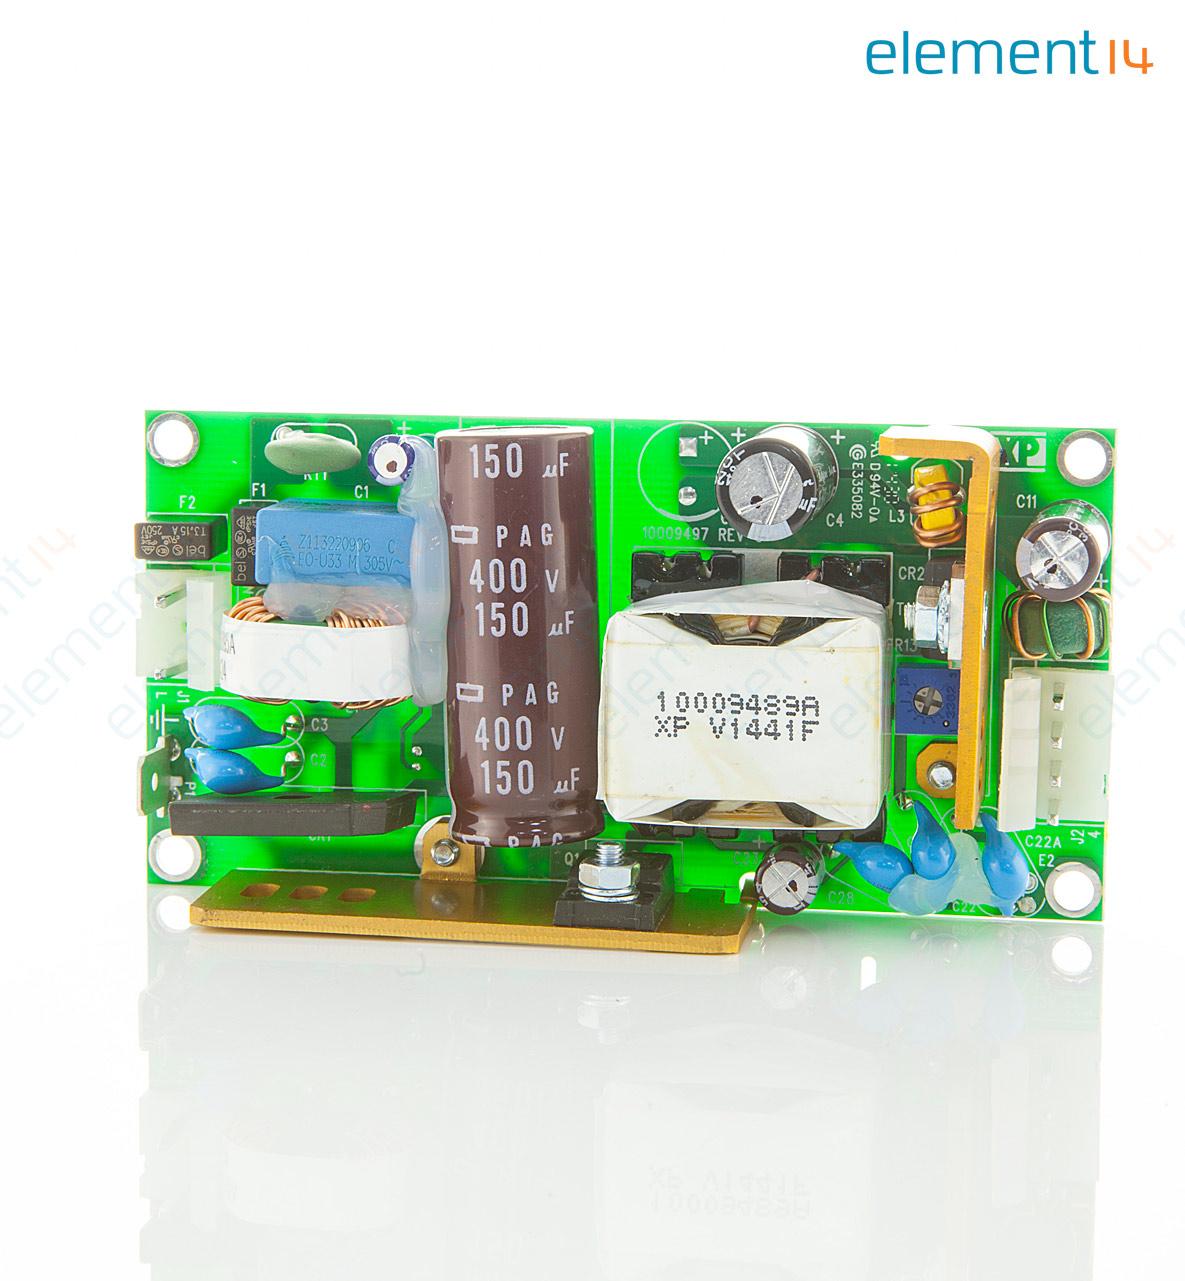 Ecs65us28 Xp Power Ac Dc Open Frame Power Supply Psu